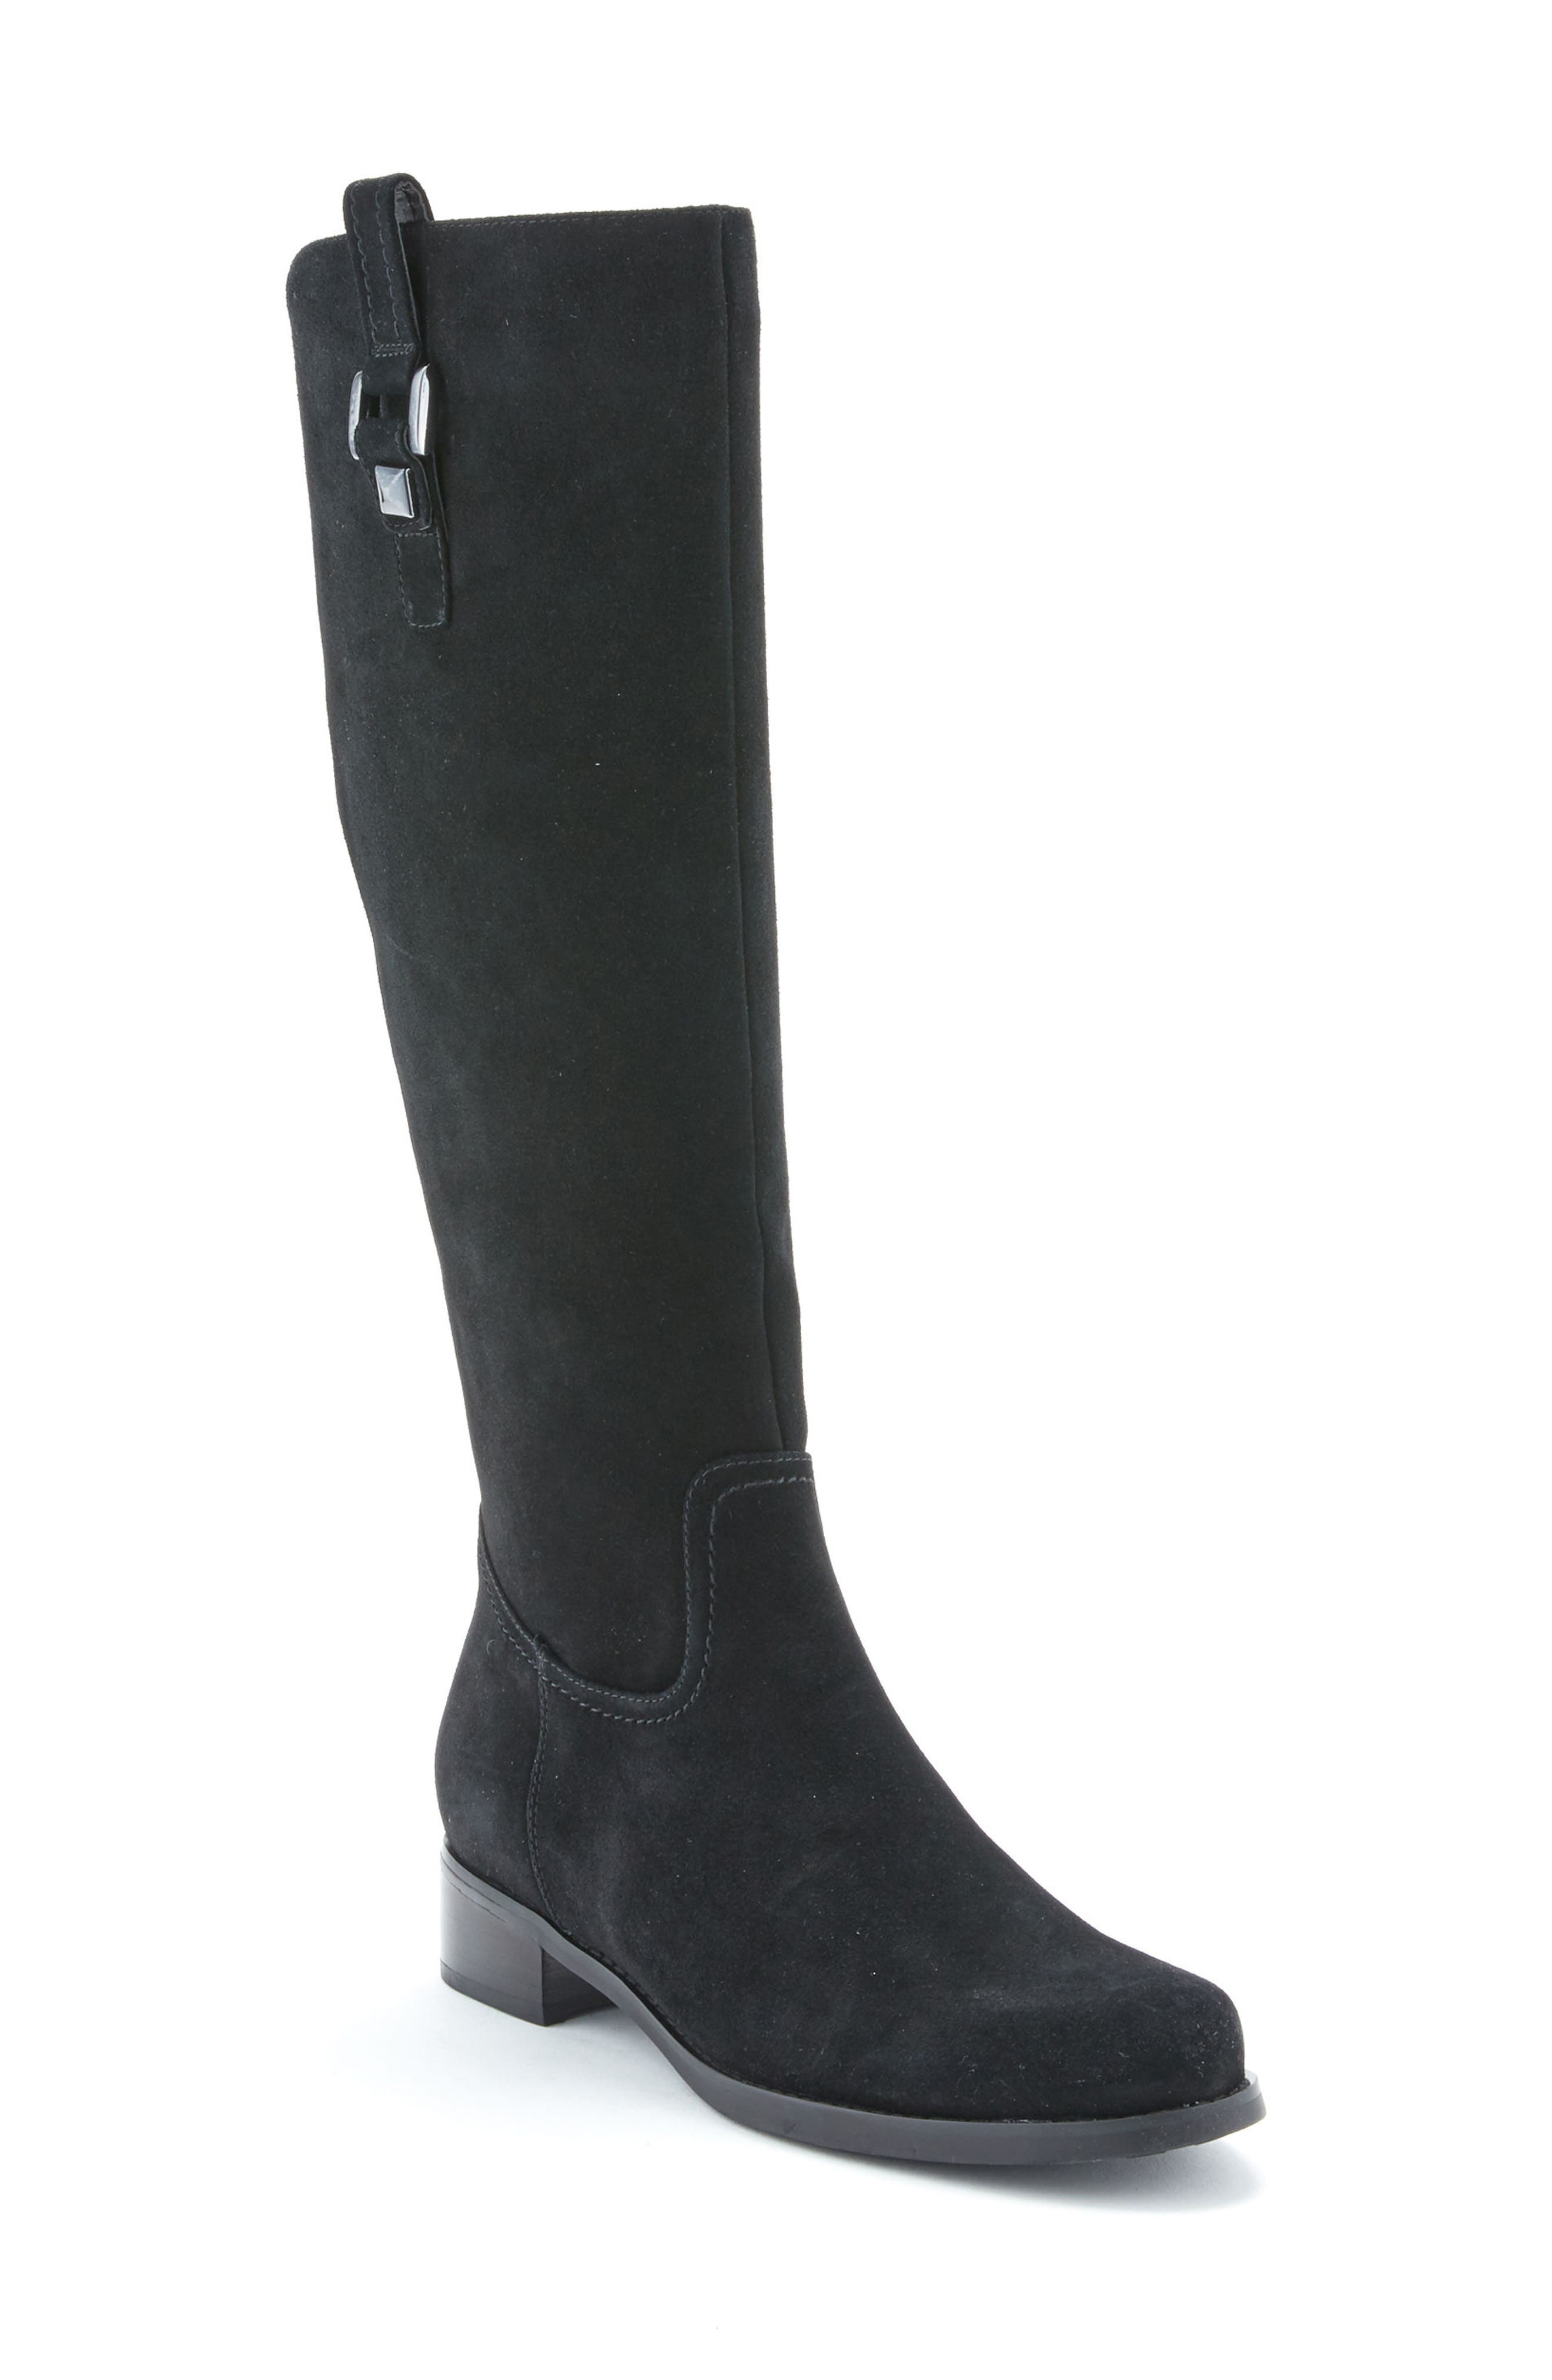 'Velvet' Waterproof Riding Boot,                             Main thumbnail 1, color,                             006